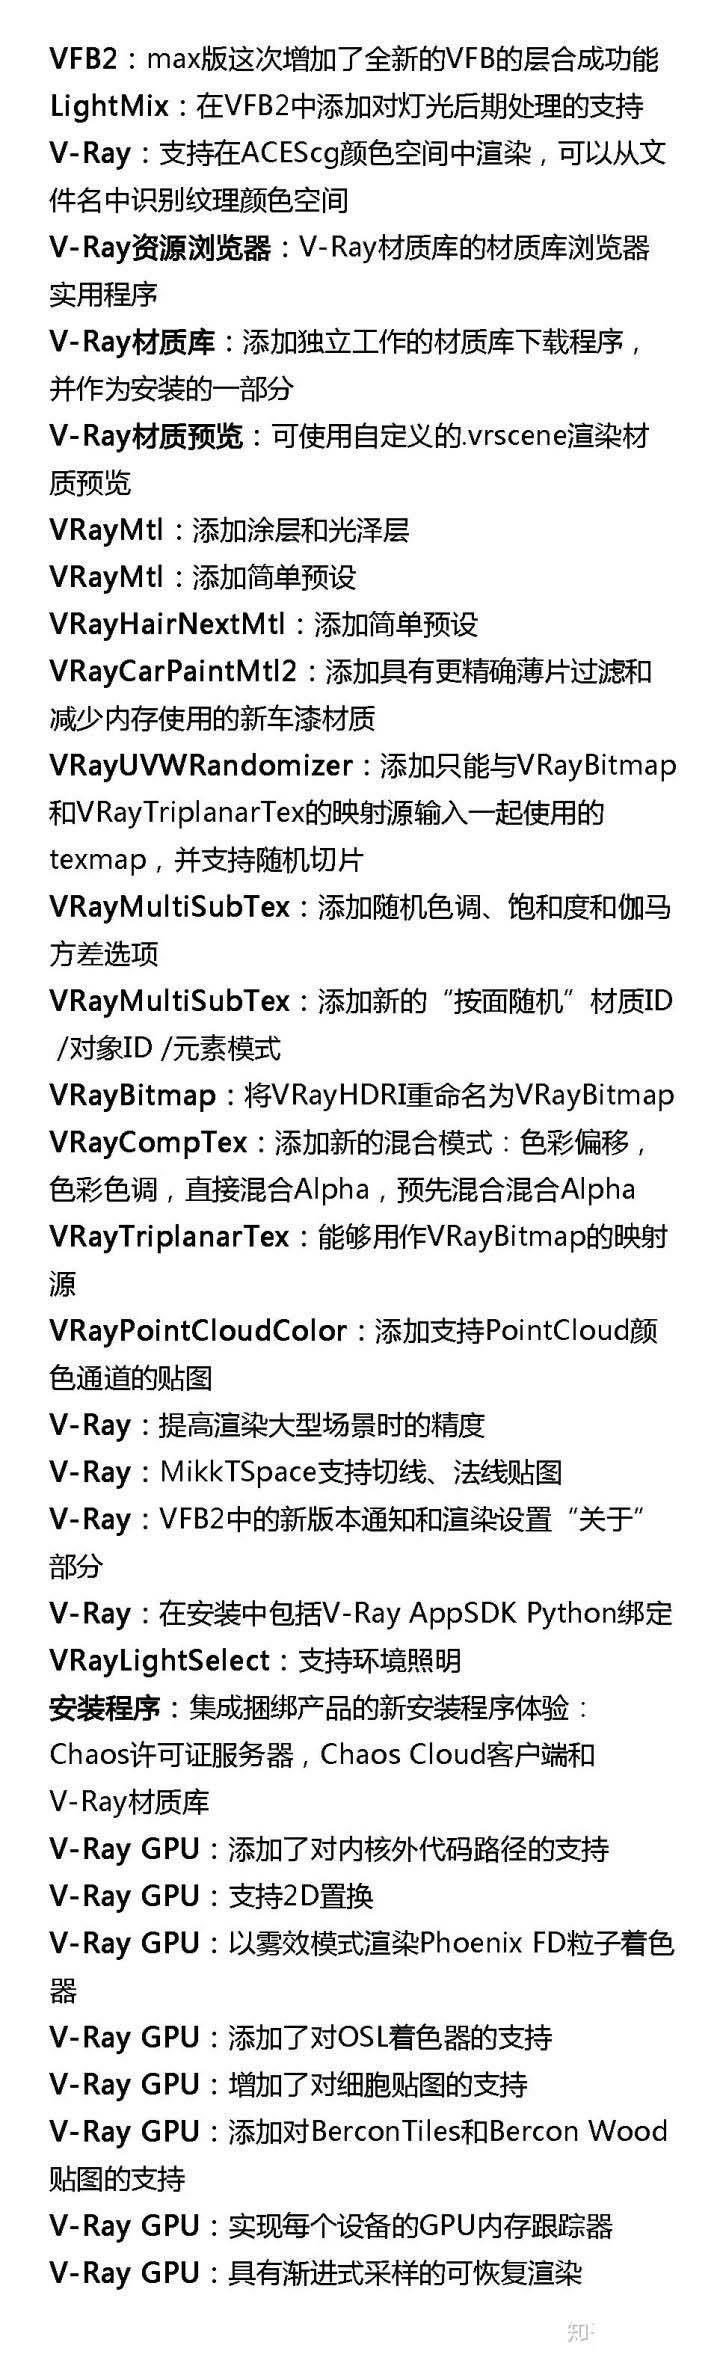 Vray5.0渲染器新功能介绍